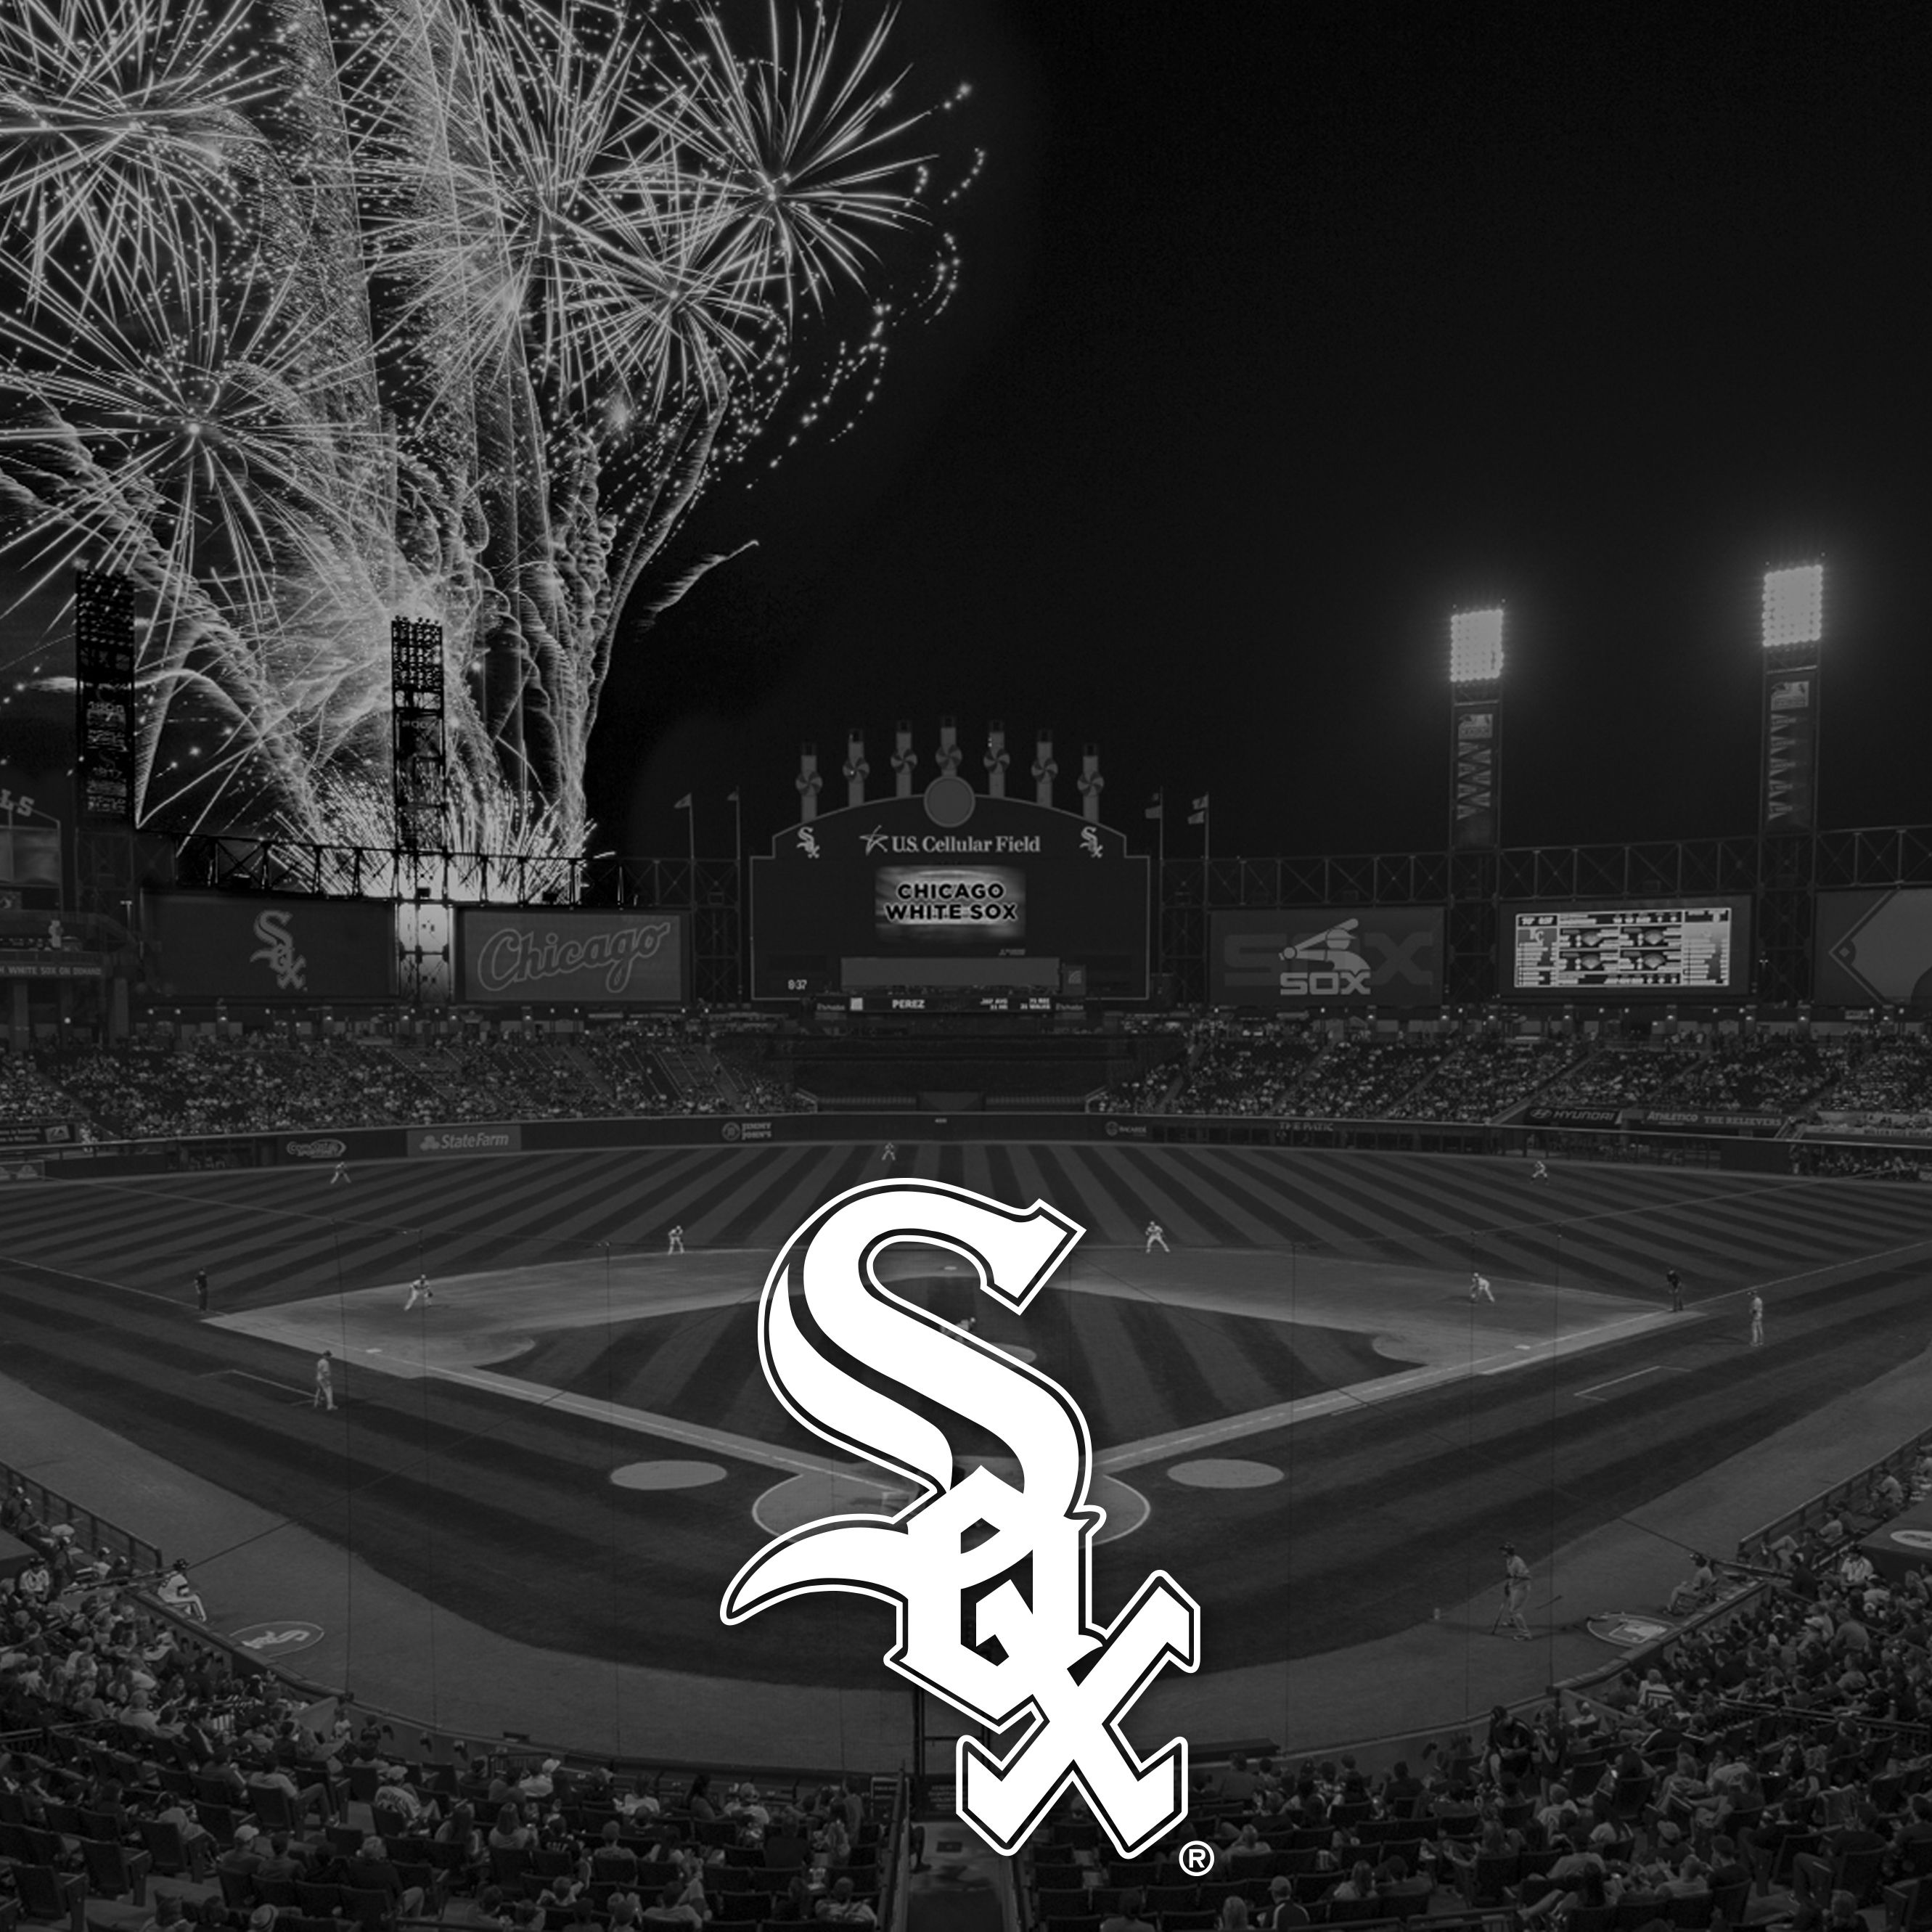 Chicago White Sox Wallpaper